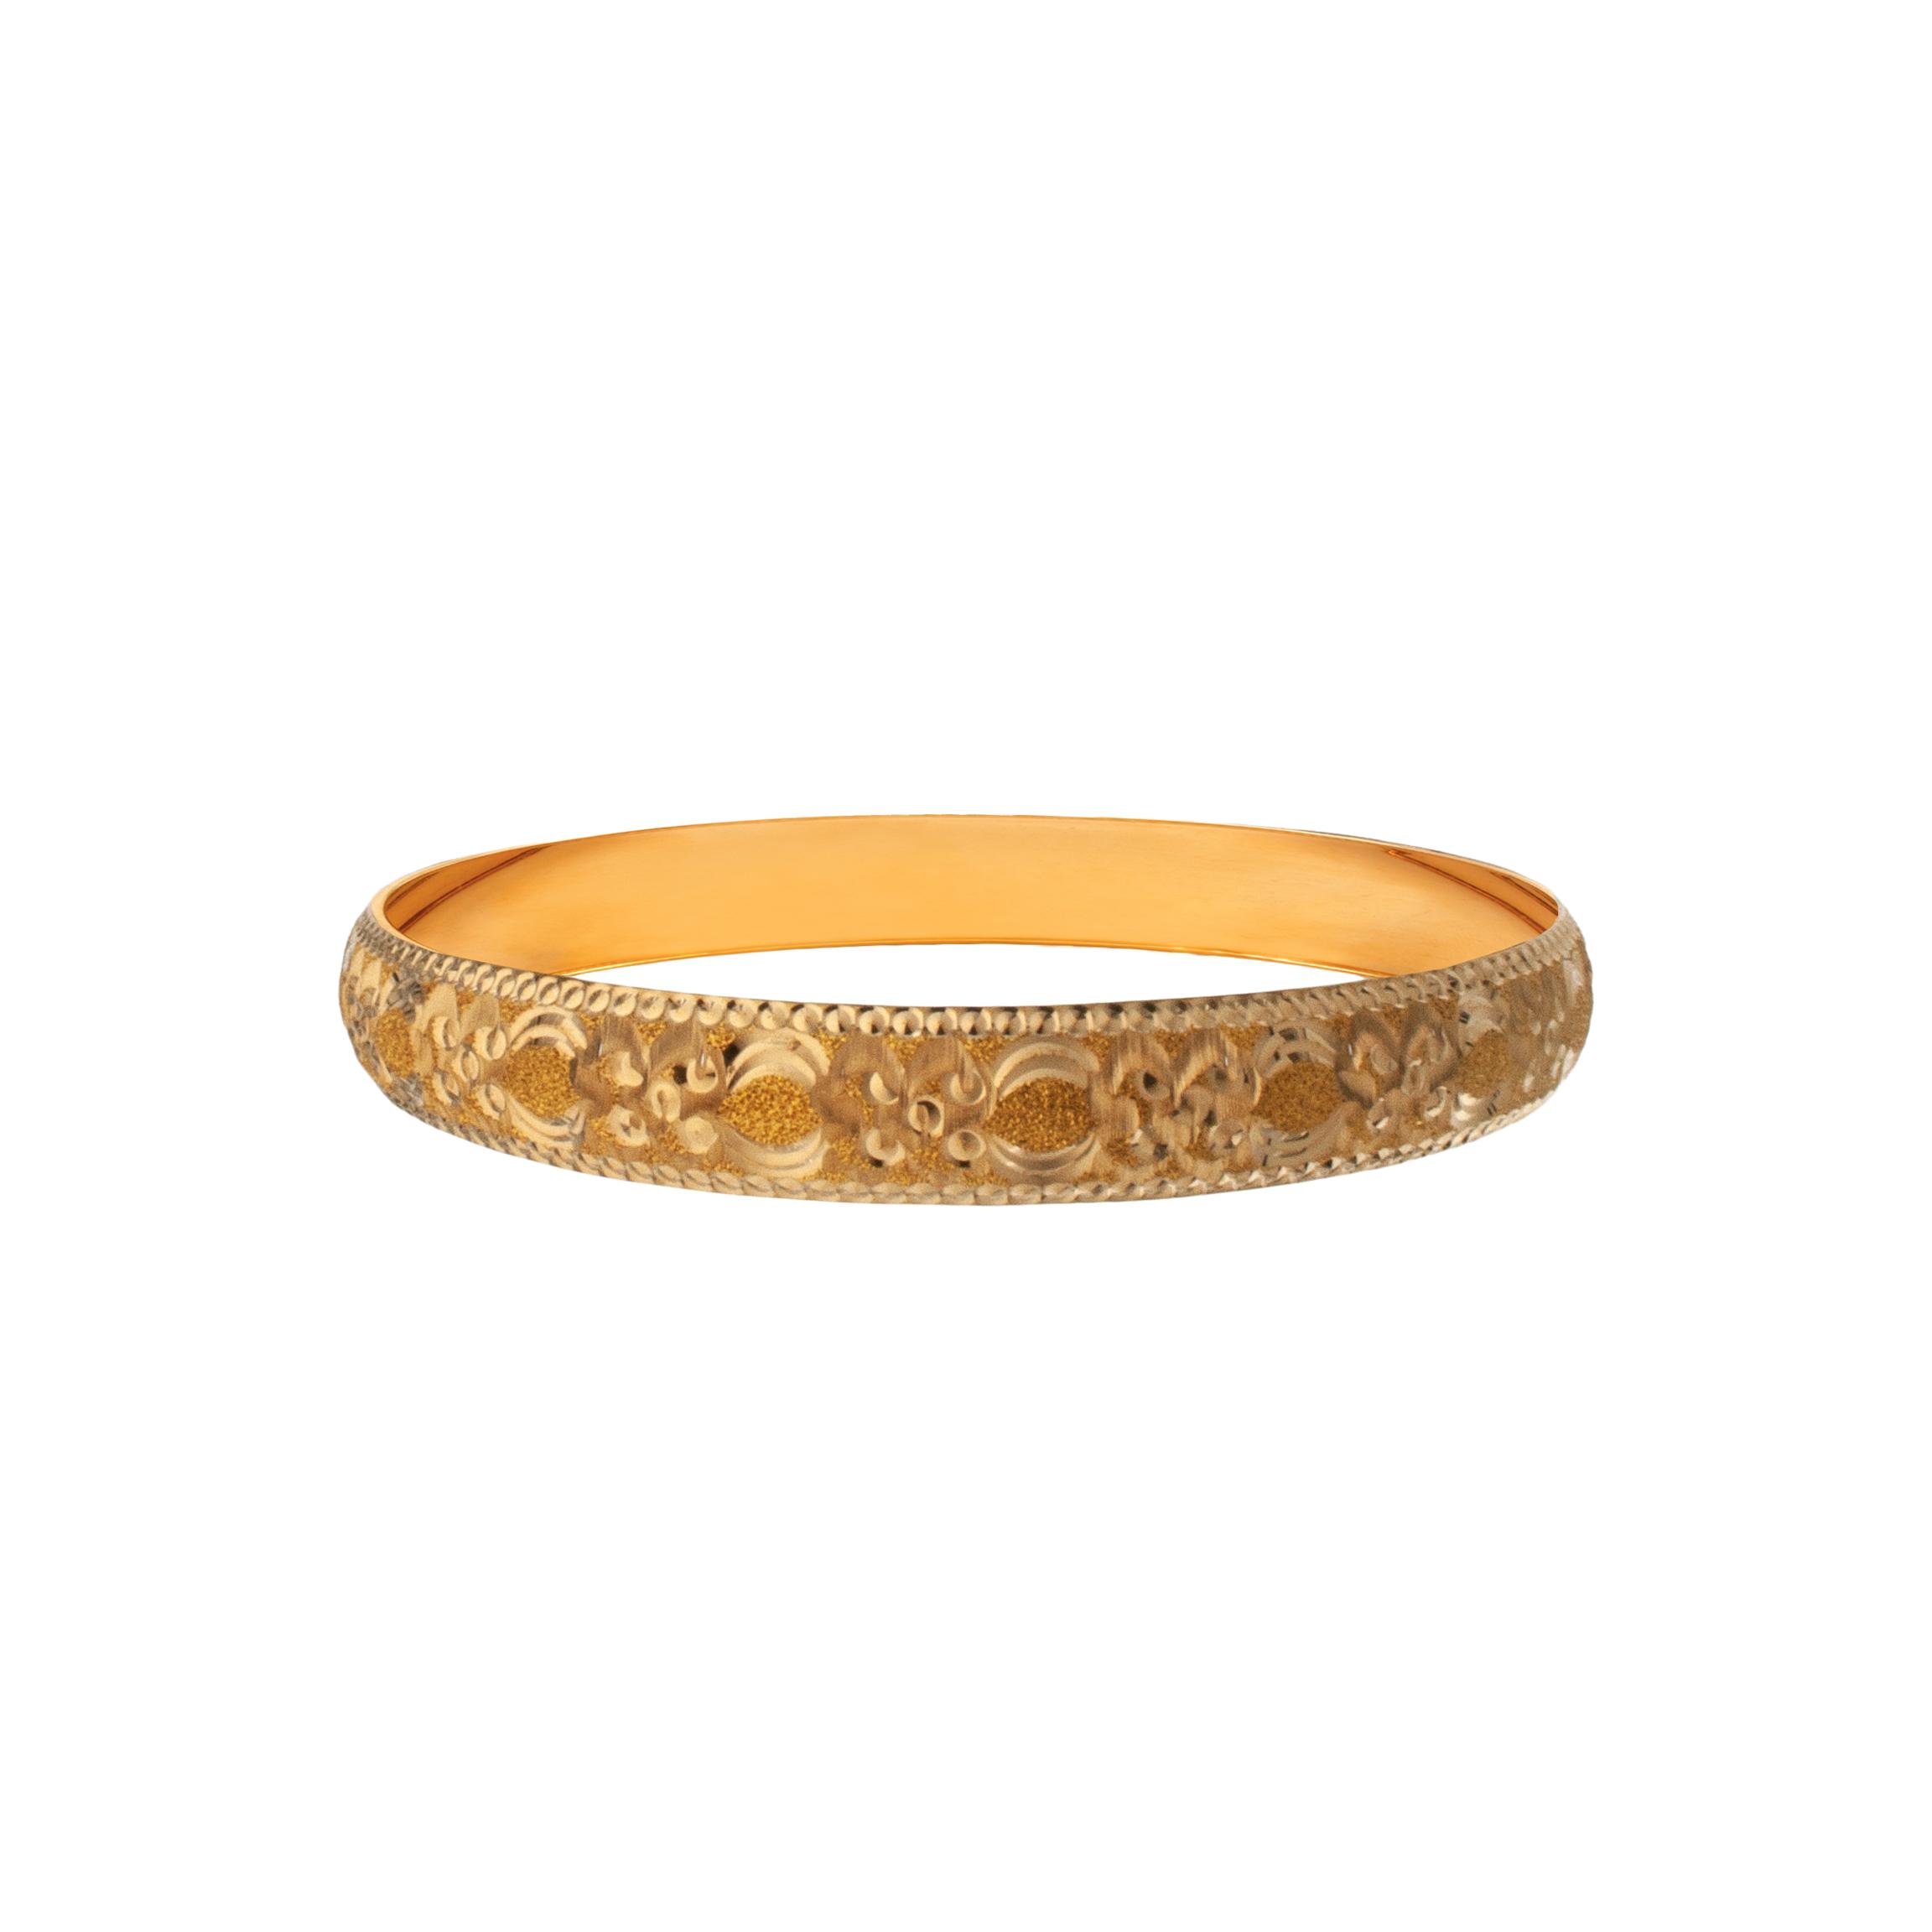 النگو طلا ۱۸ عیار زنانه دُرج مدل VB02-1